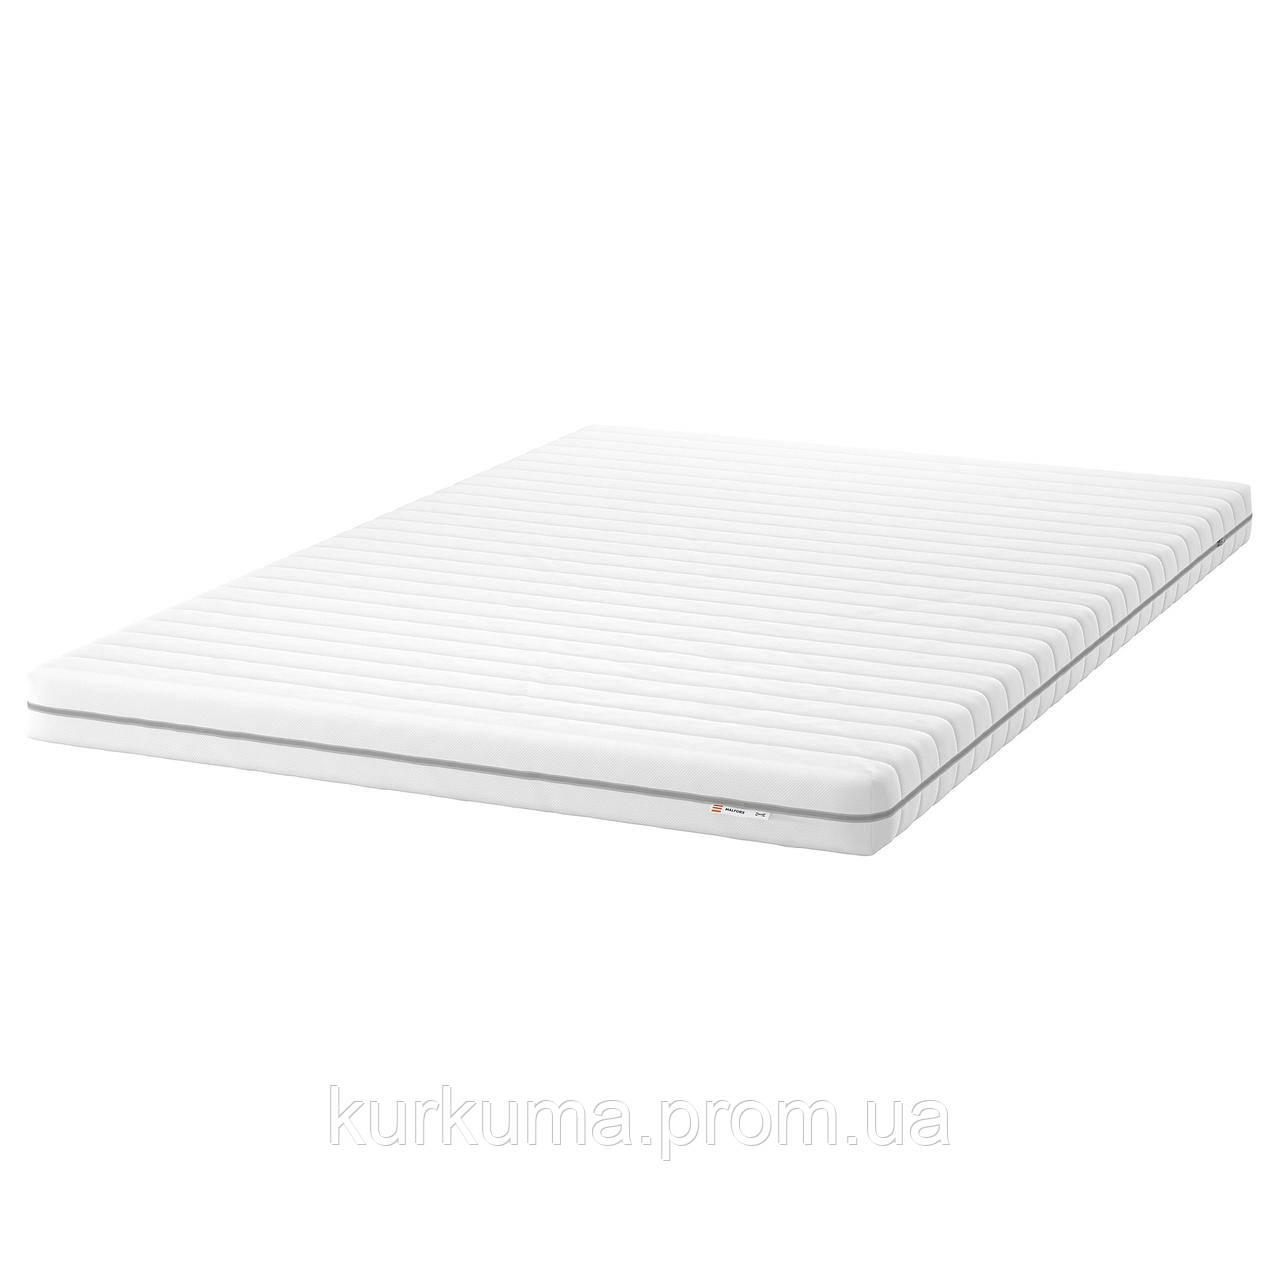 IKEA MALFORS Пенополиуретановый матрас, твердый/белый, 140х200 см (502.723.00)